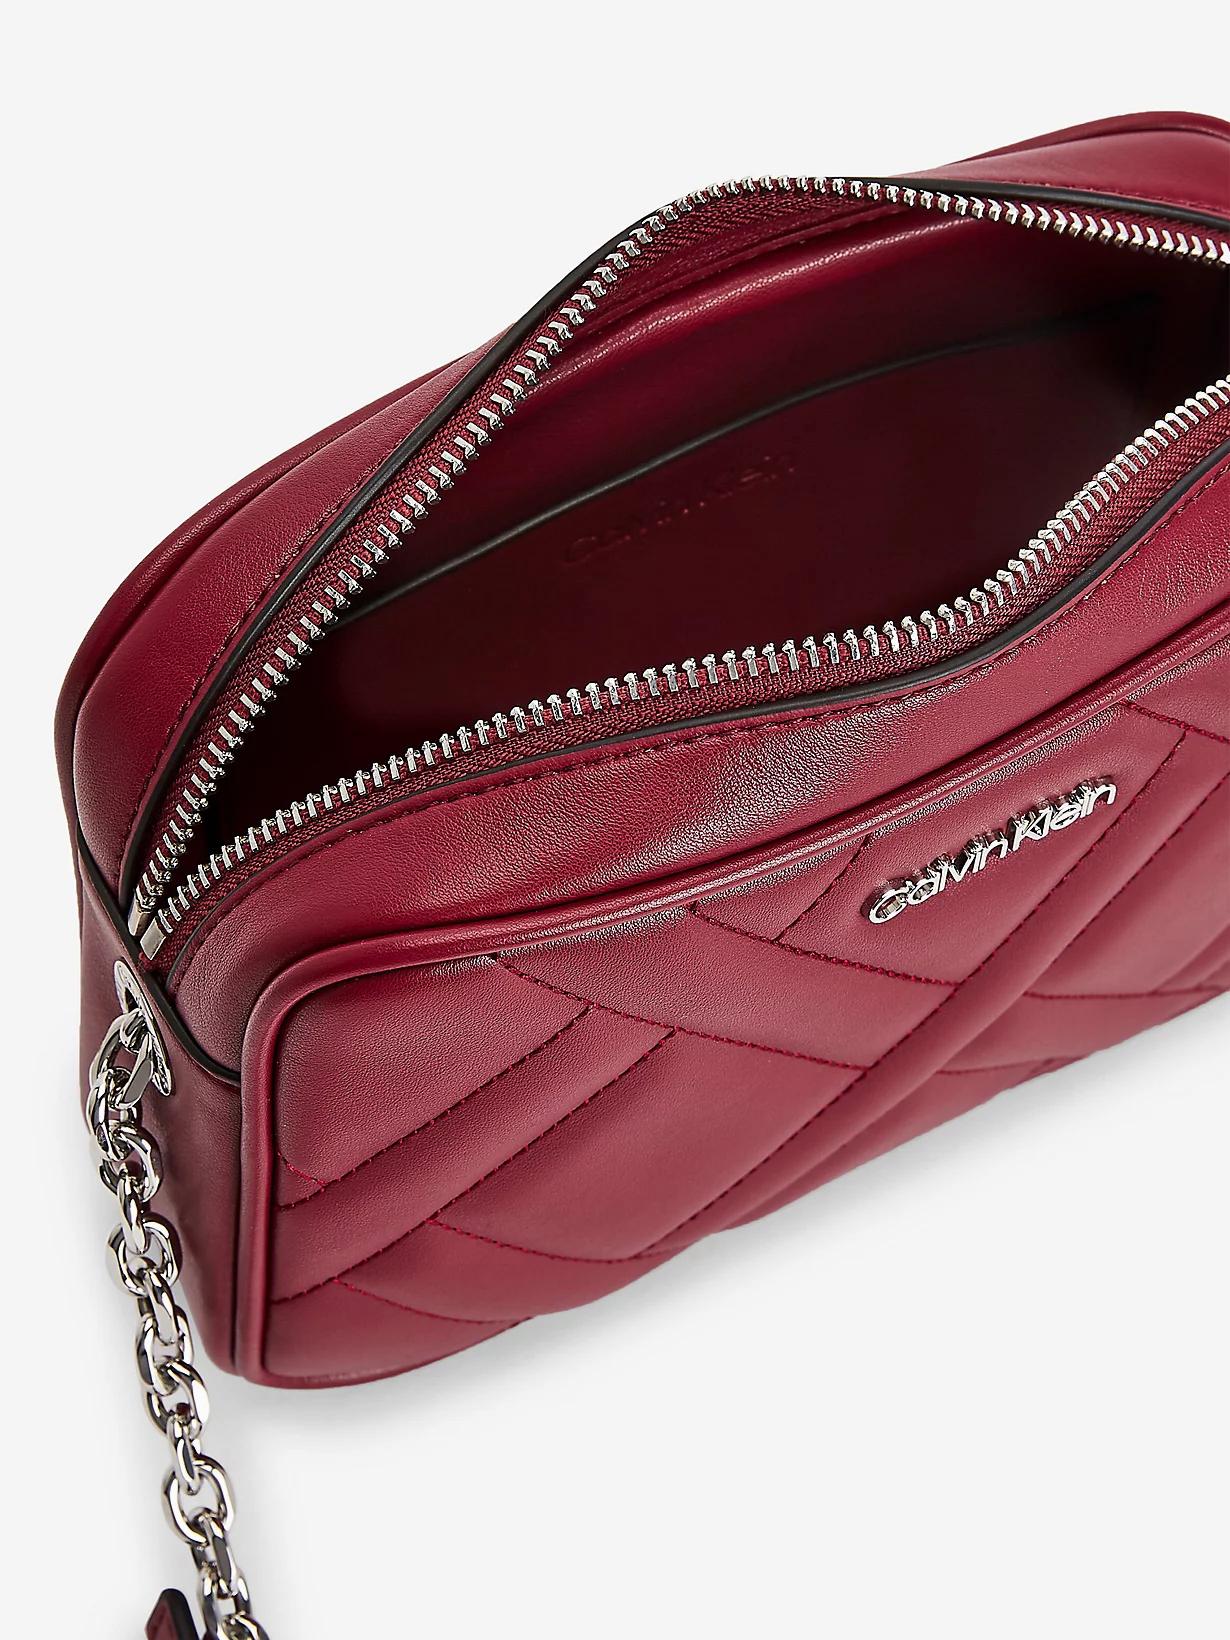 Calvin Klein wiśniowy/bordowy crossbody torebka